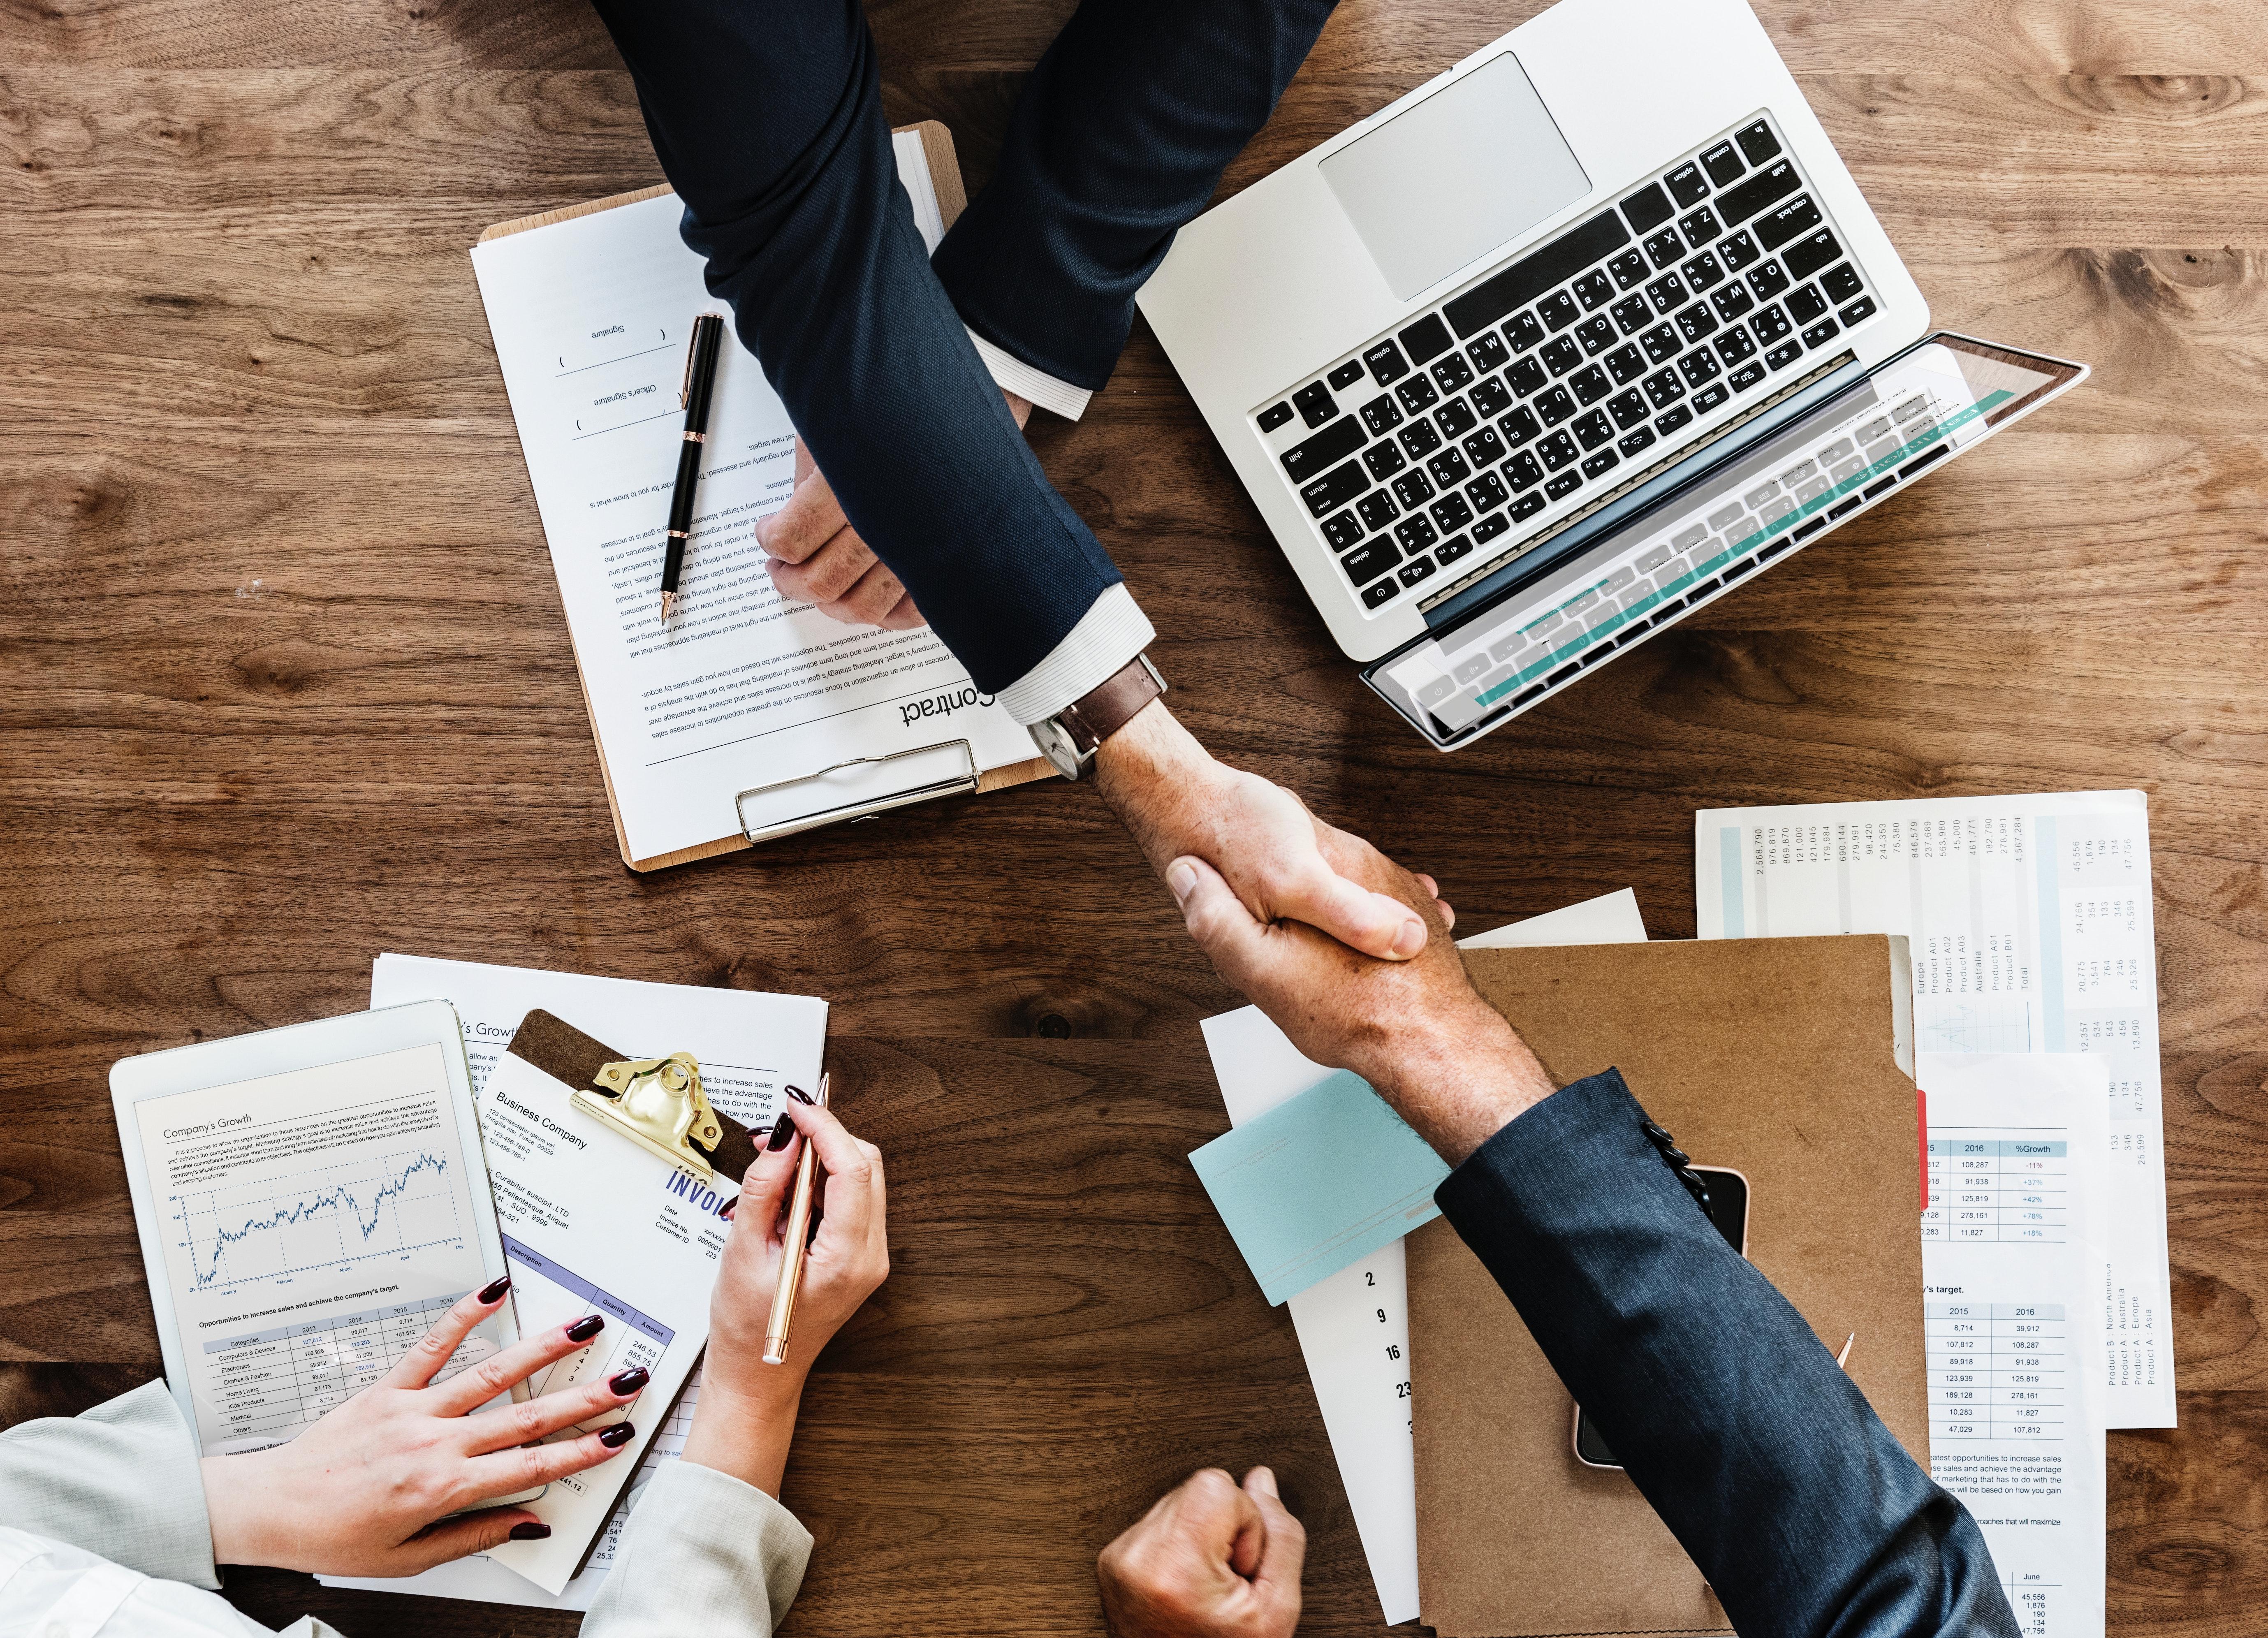 Contract negotiation help